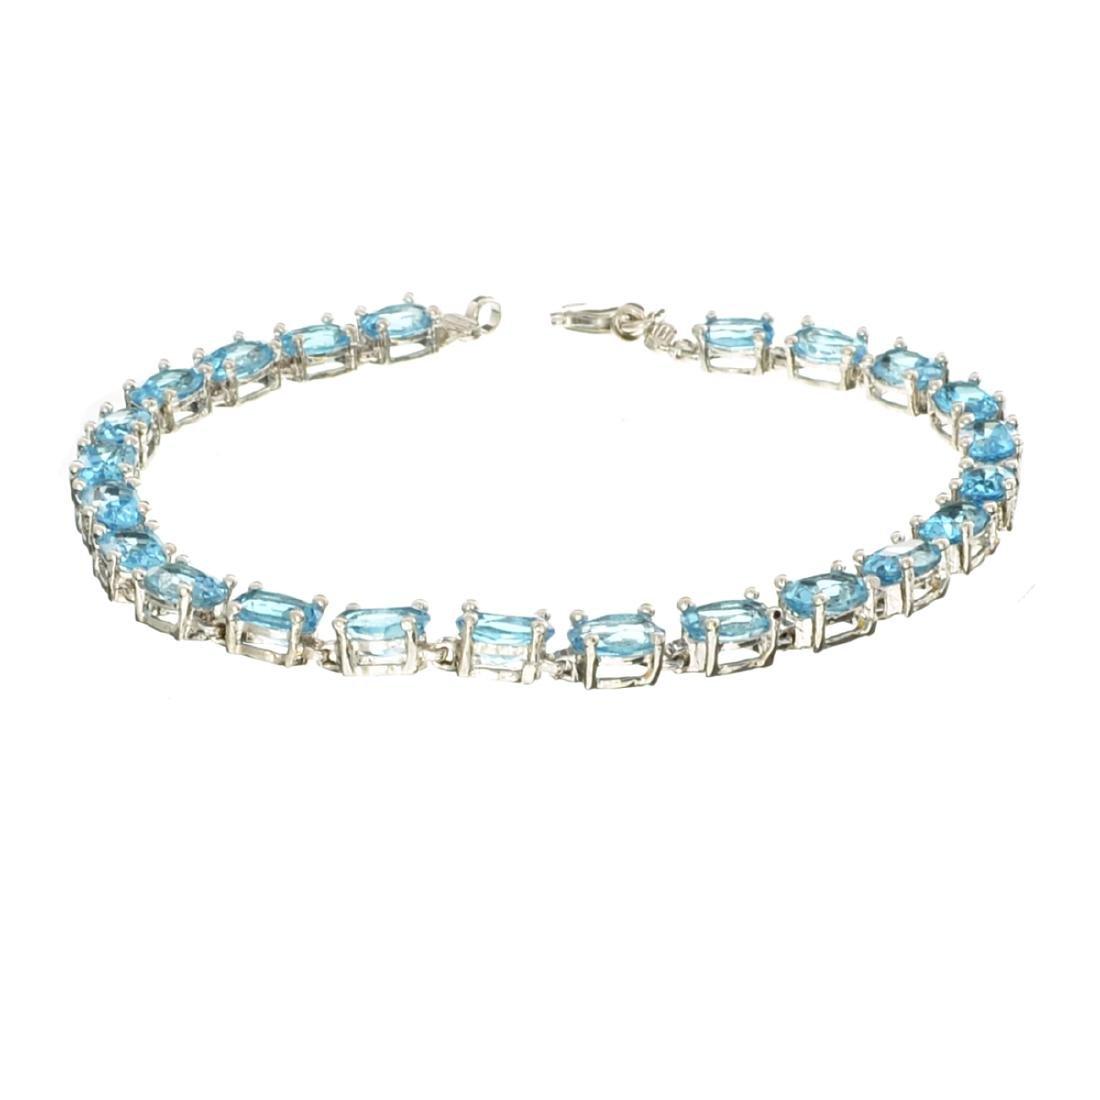 APP: 0.9k Fine Jewelry 9.70CT Oval Cut Blue Topaz And